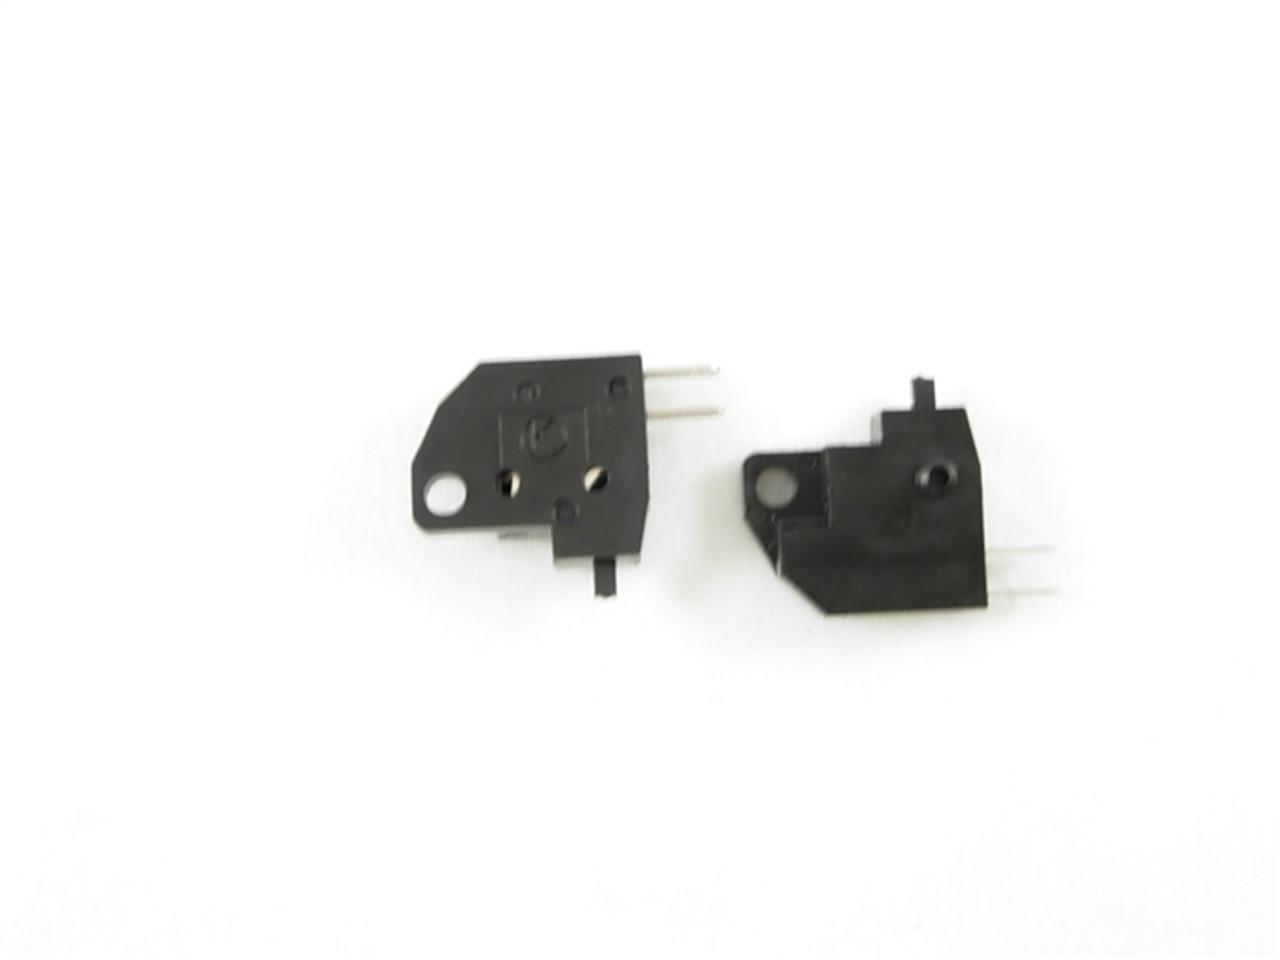 BRAKE SWITCH (left side) sensor 11910-A107-2